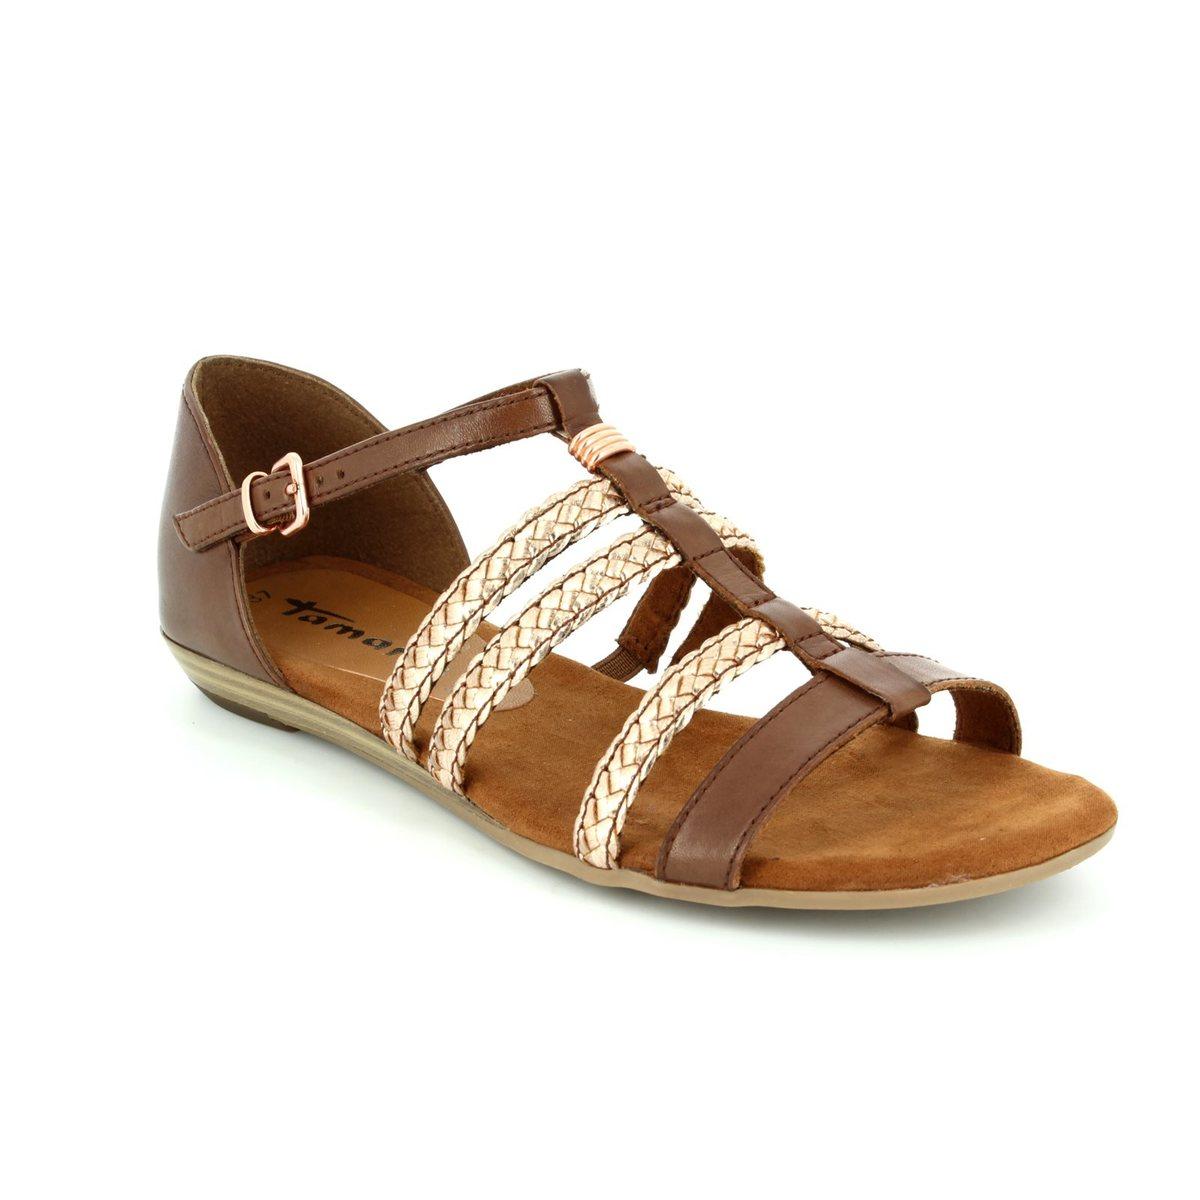 tamaris verbena 28108 363 tan multi sandals. Black Bedroom Furniture Sets. Home Design Ideas